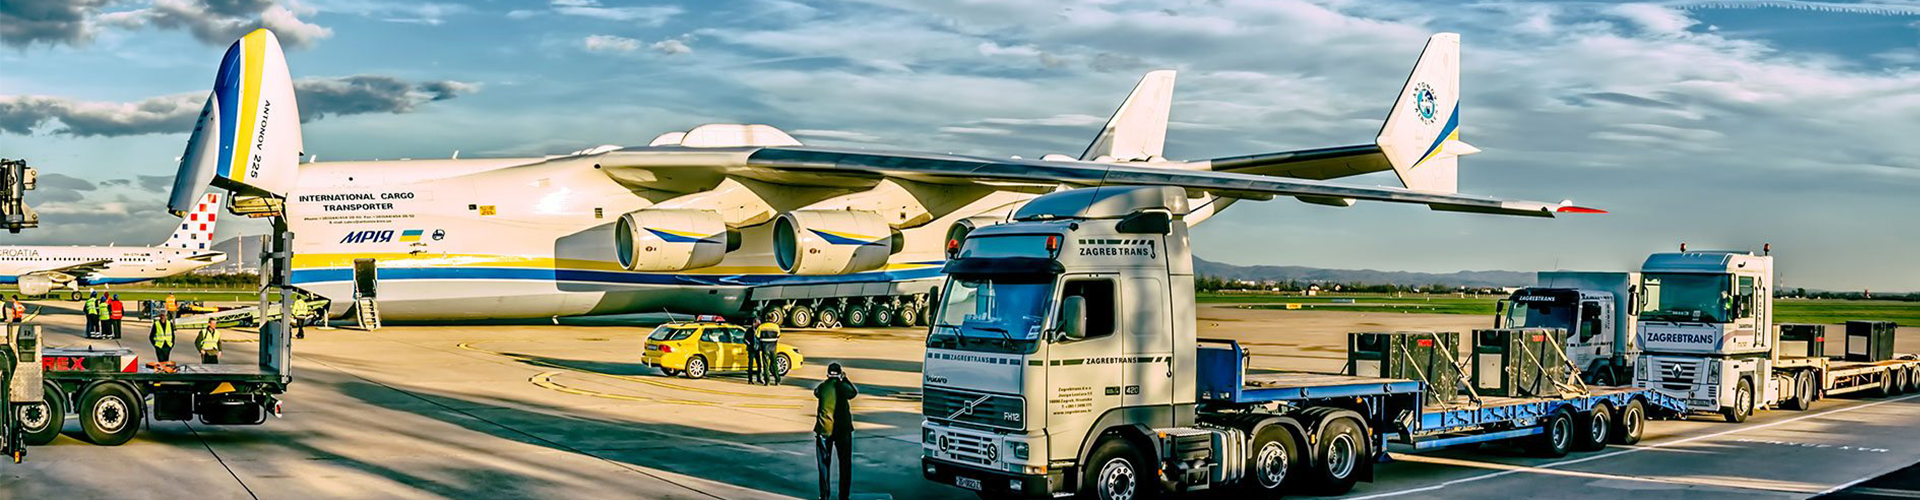 Air Freight | Intelligent Team Cargo Services